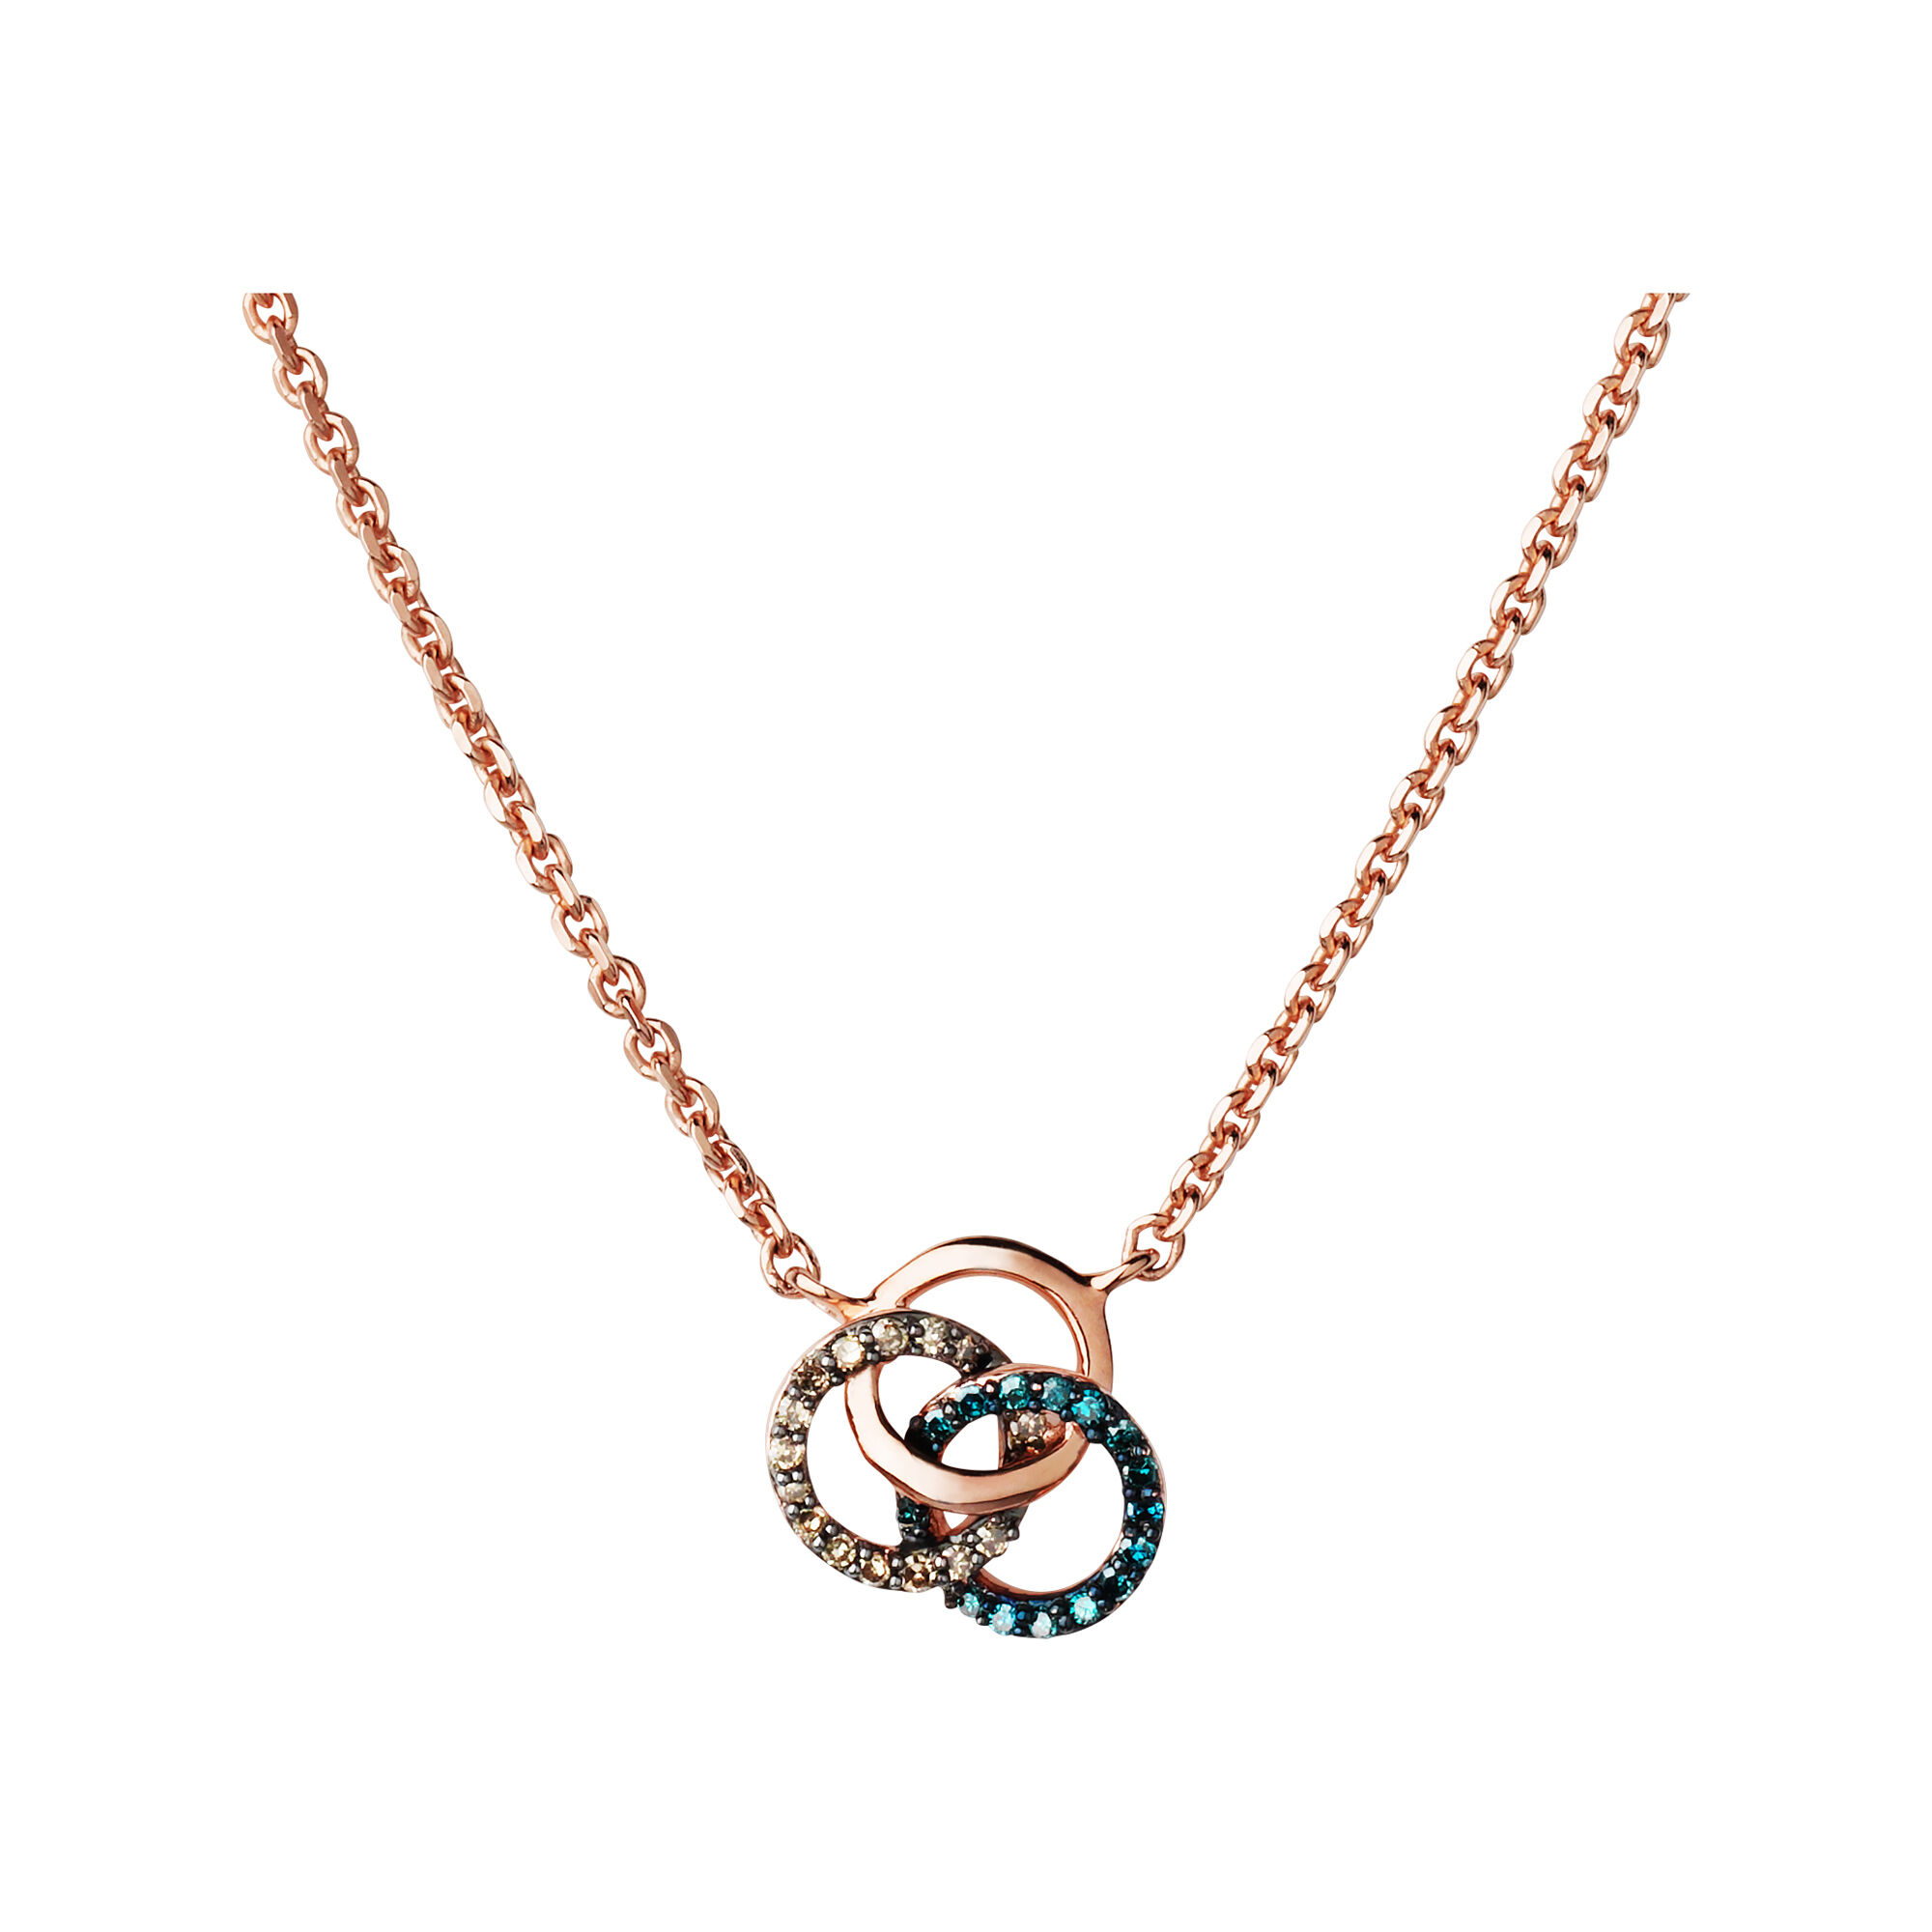 treasured rose gold champagne blue diamond necklace. Black Bedroom Furniture Sets. Home Design Ideas